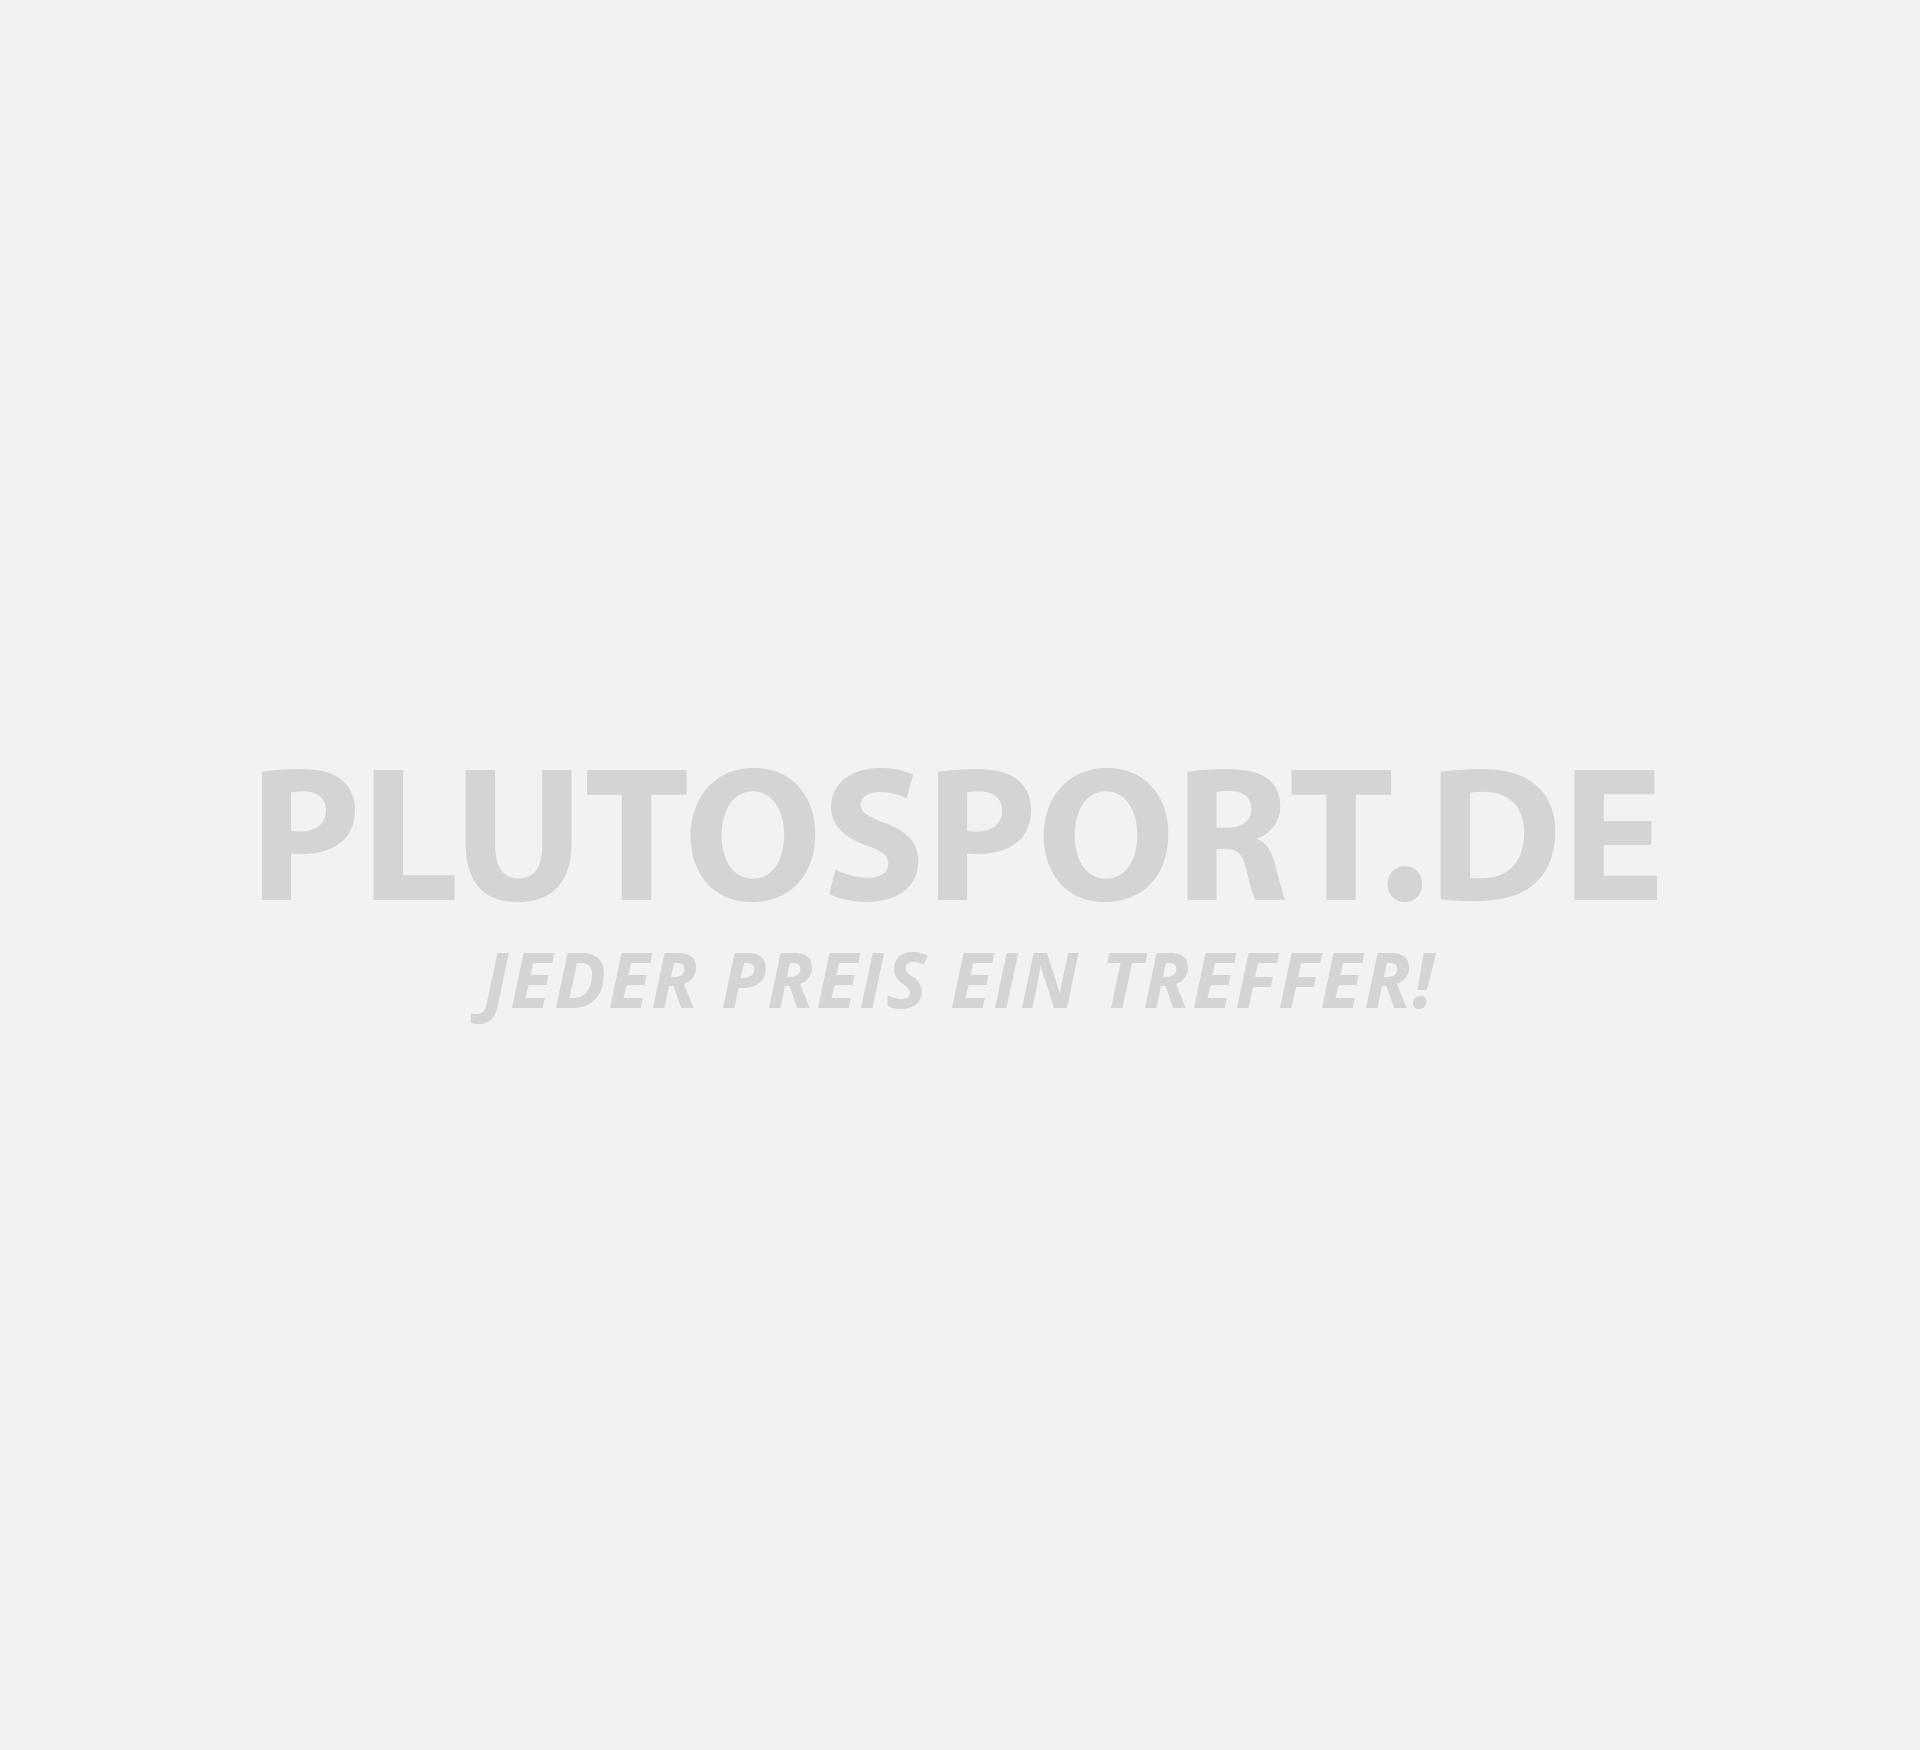 Adidas Kempa Uhlsport Puma Salomon Schuhe und mehr Top Preis